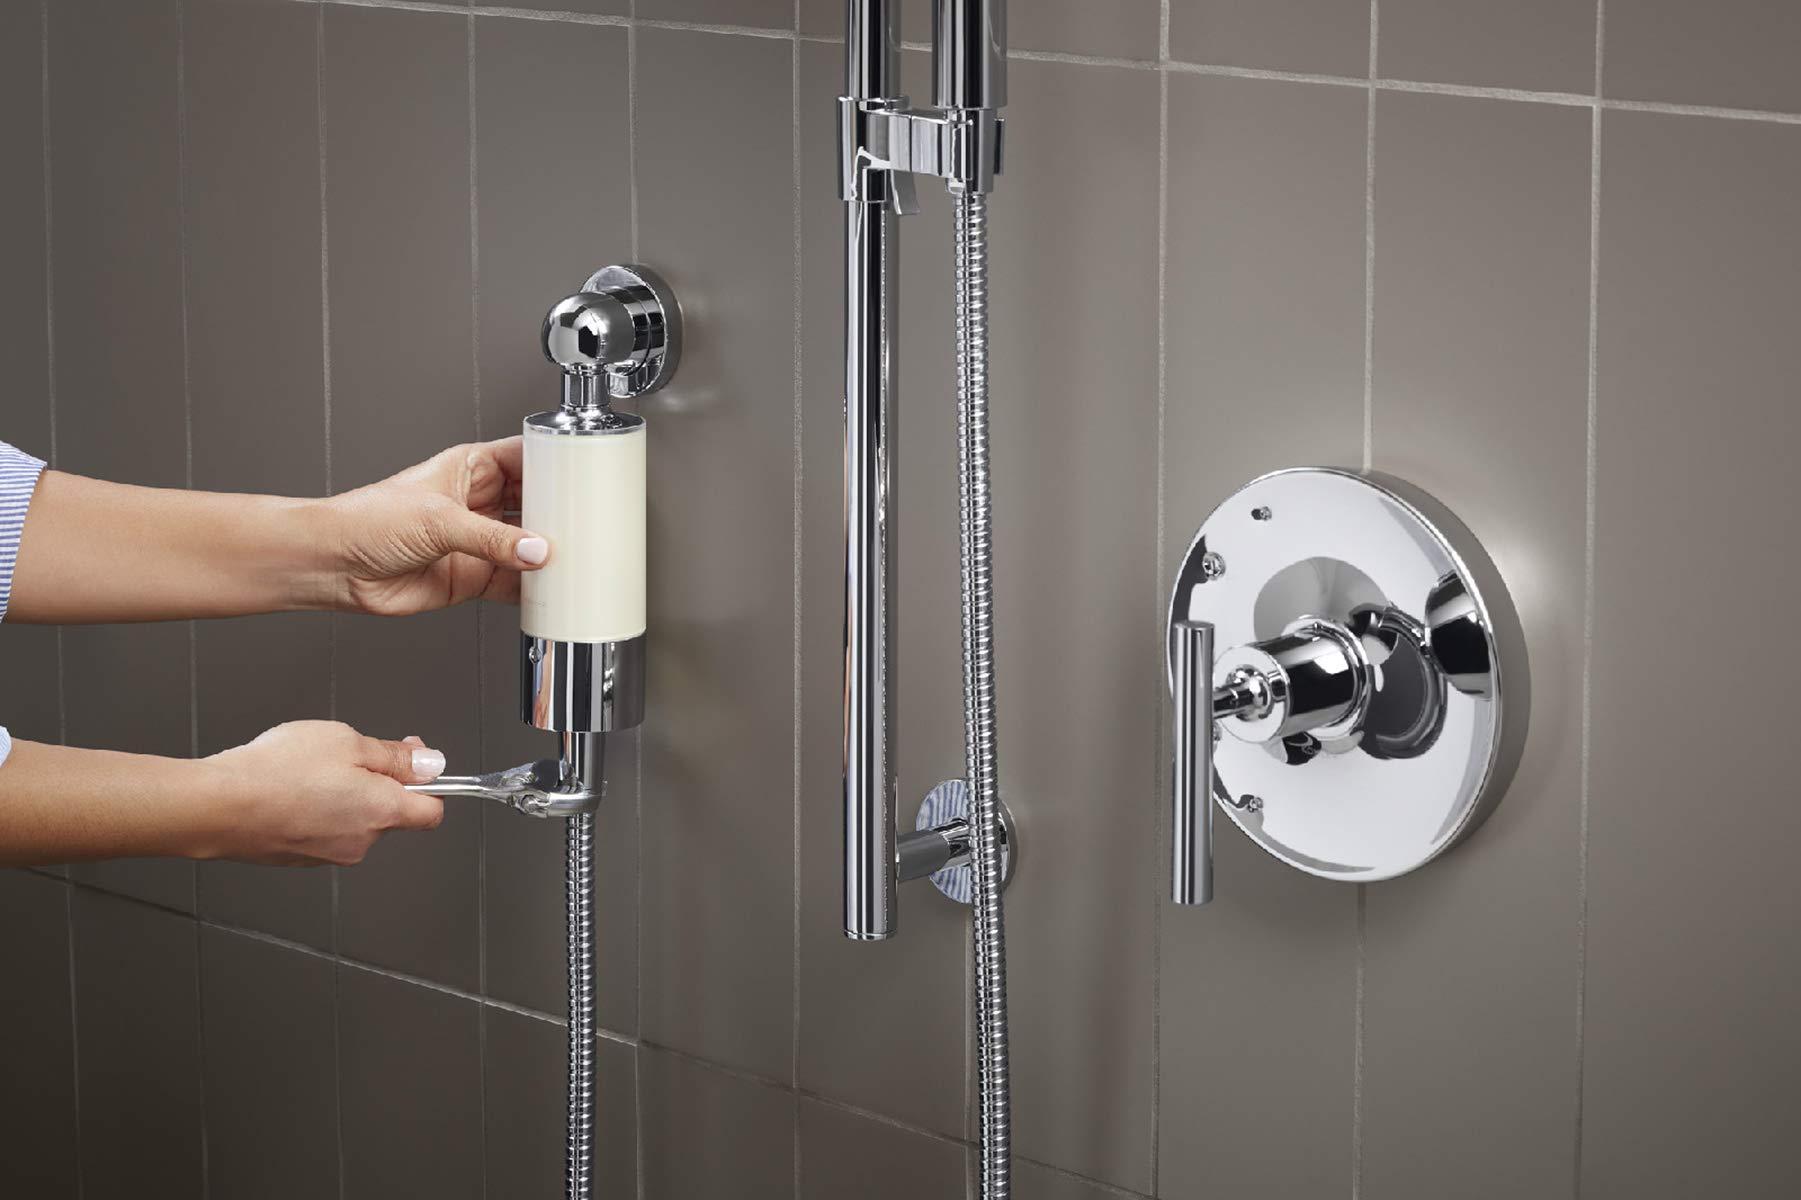 Kohler 30646-CP Aquifer Shower Water Filtration System, Reduce Chlorine and Odor, Includes Filter Replacement by Kohler (Image #16)